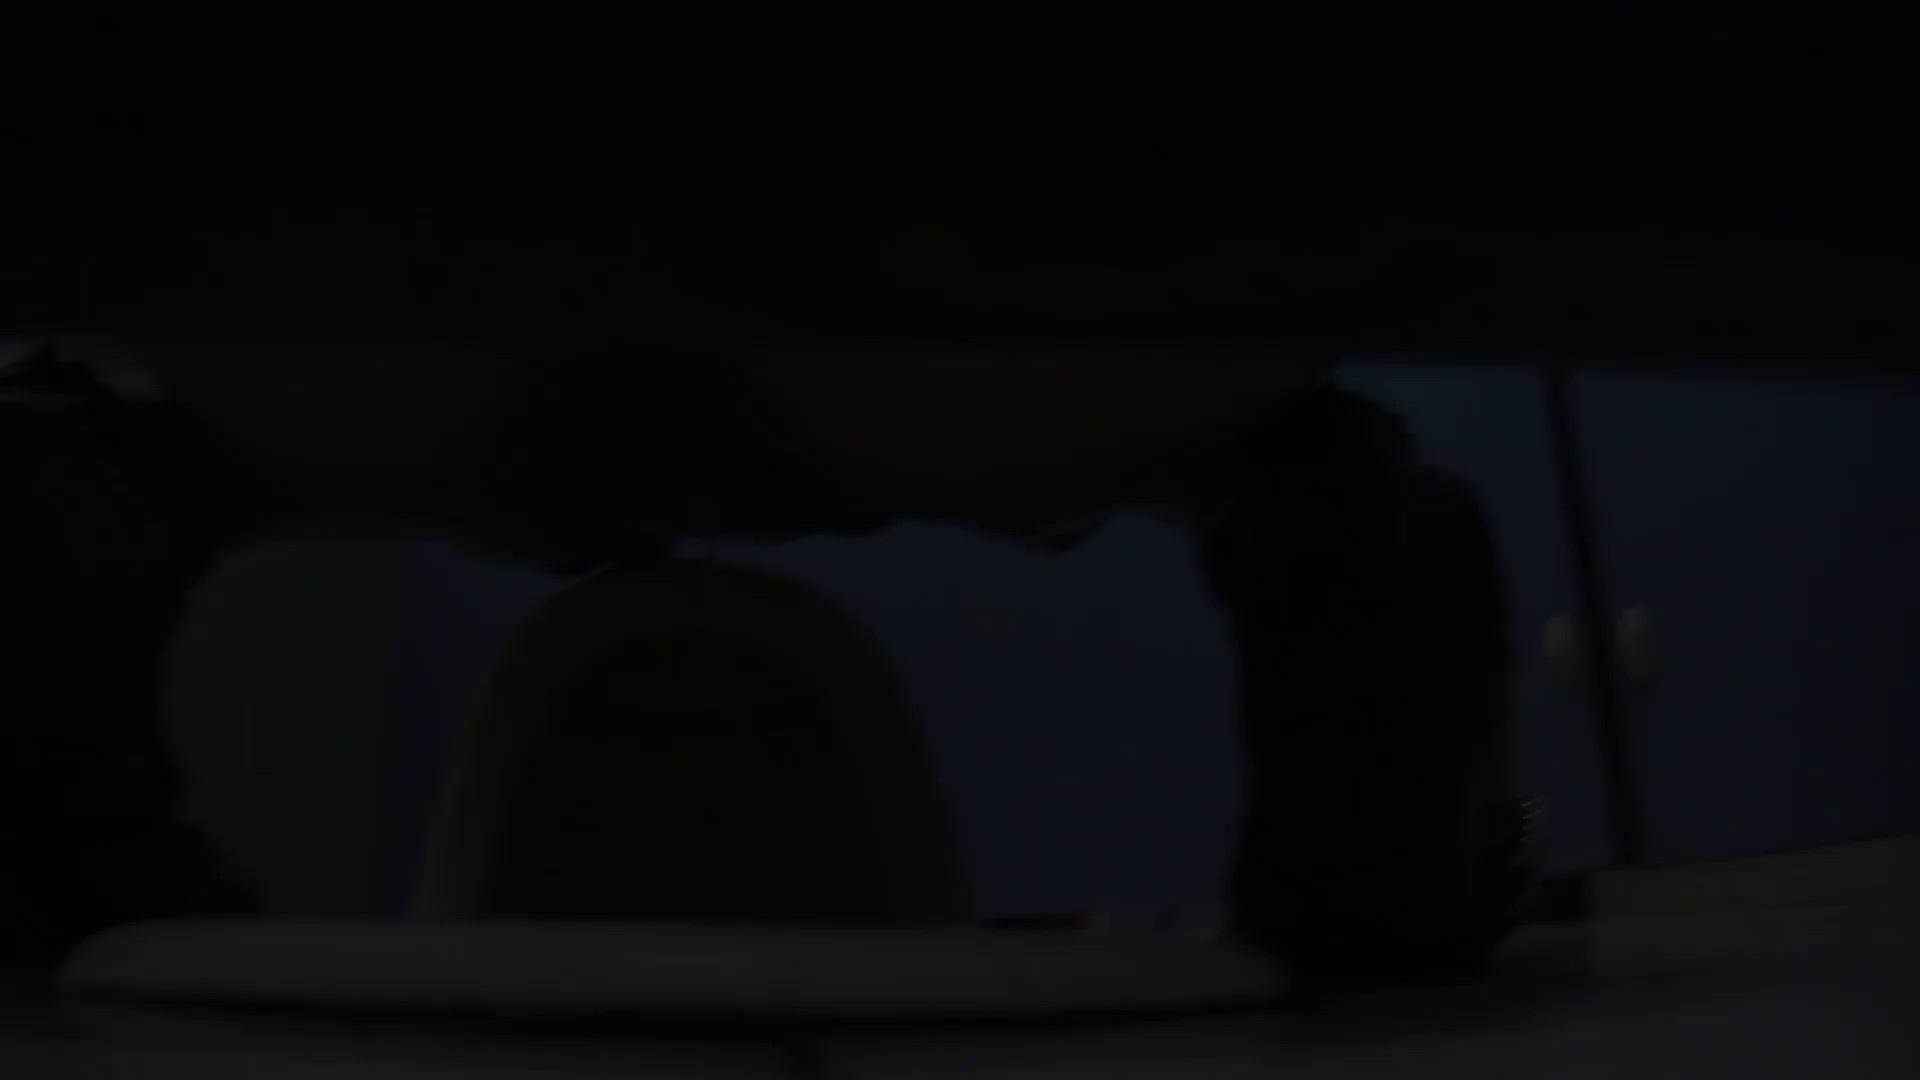 JD盗撮 美女の洗面所の秘密 Vol.78 トイレで・・・ ワレメ動画紹介 89画像 79